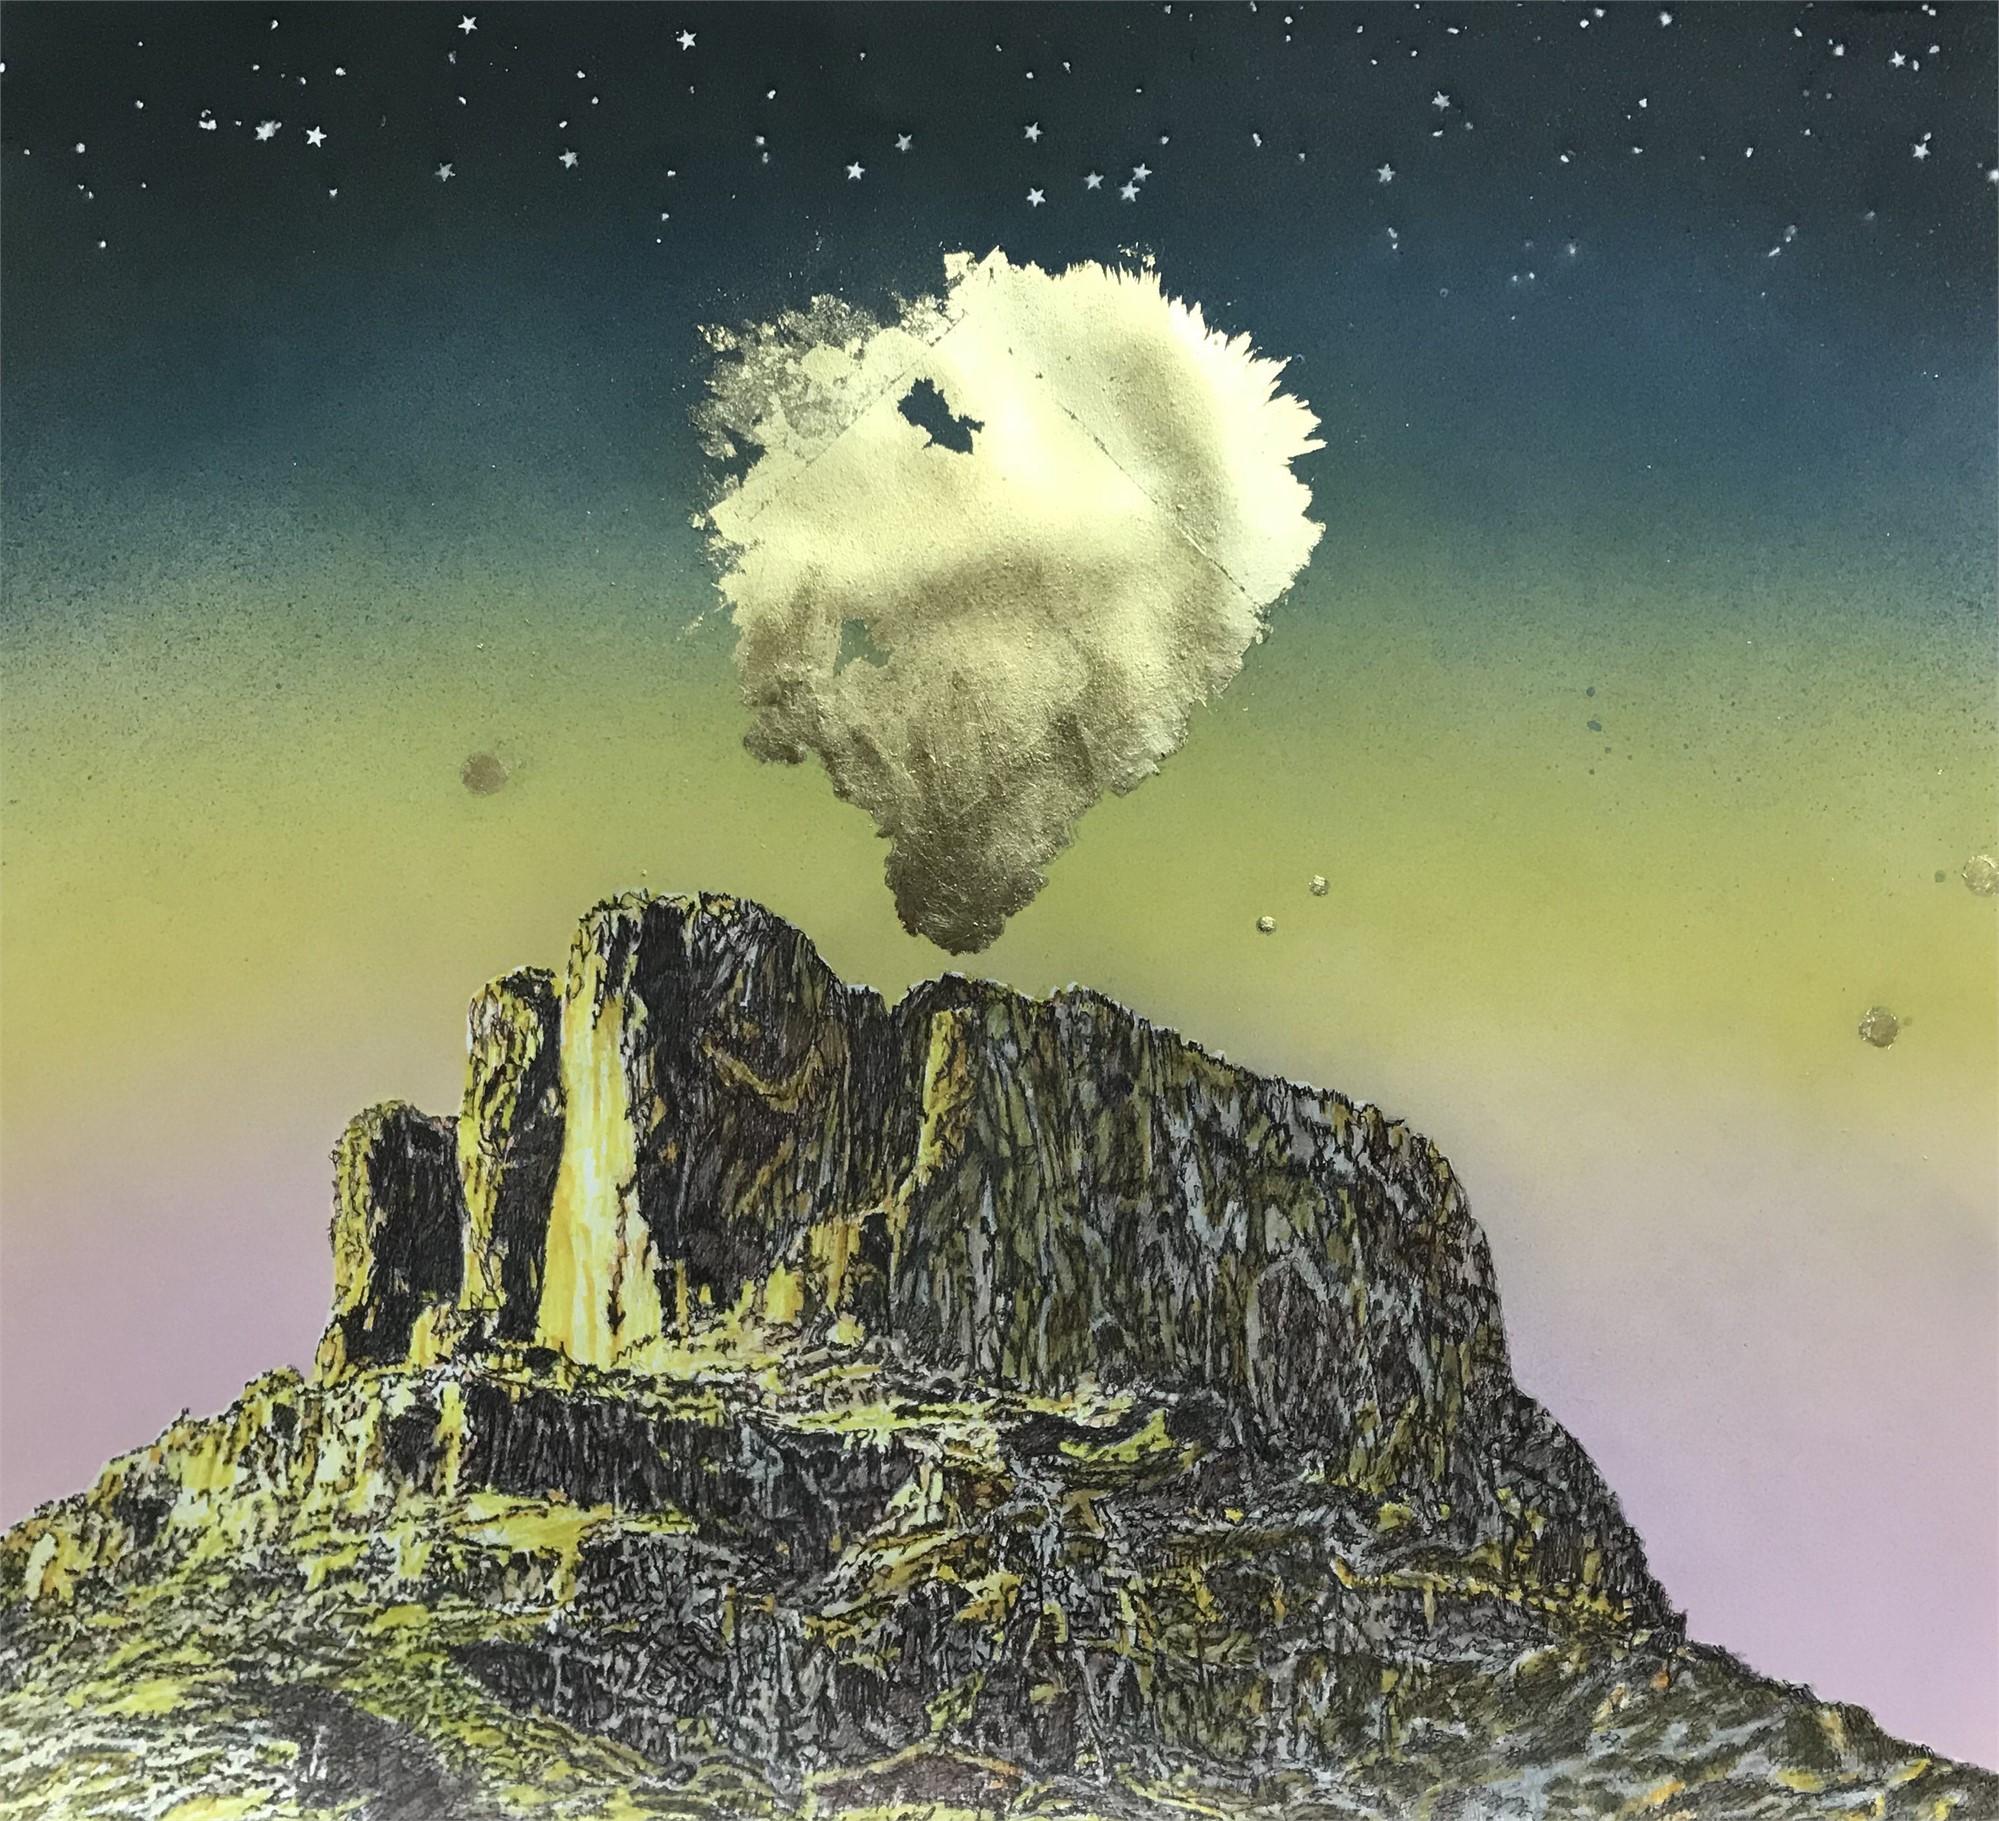 Cloud Nine by Jim Malone